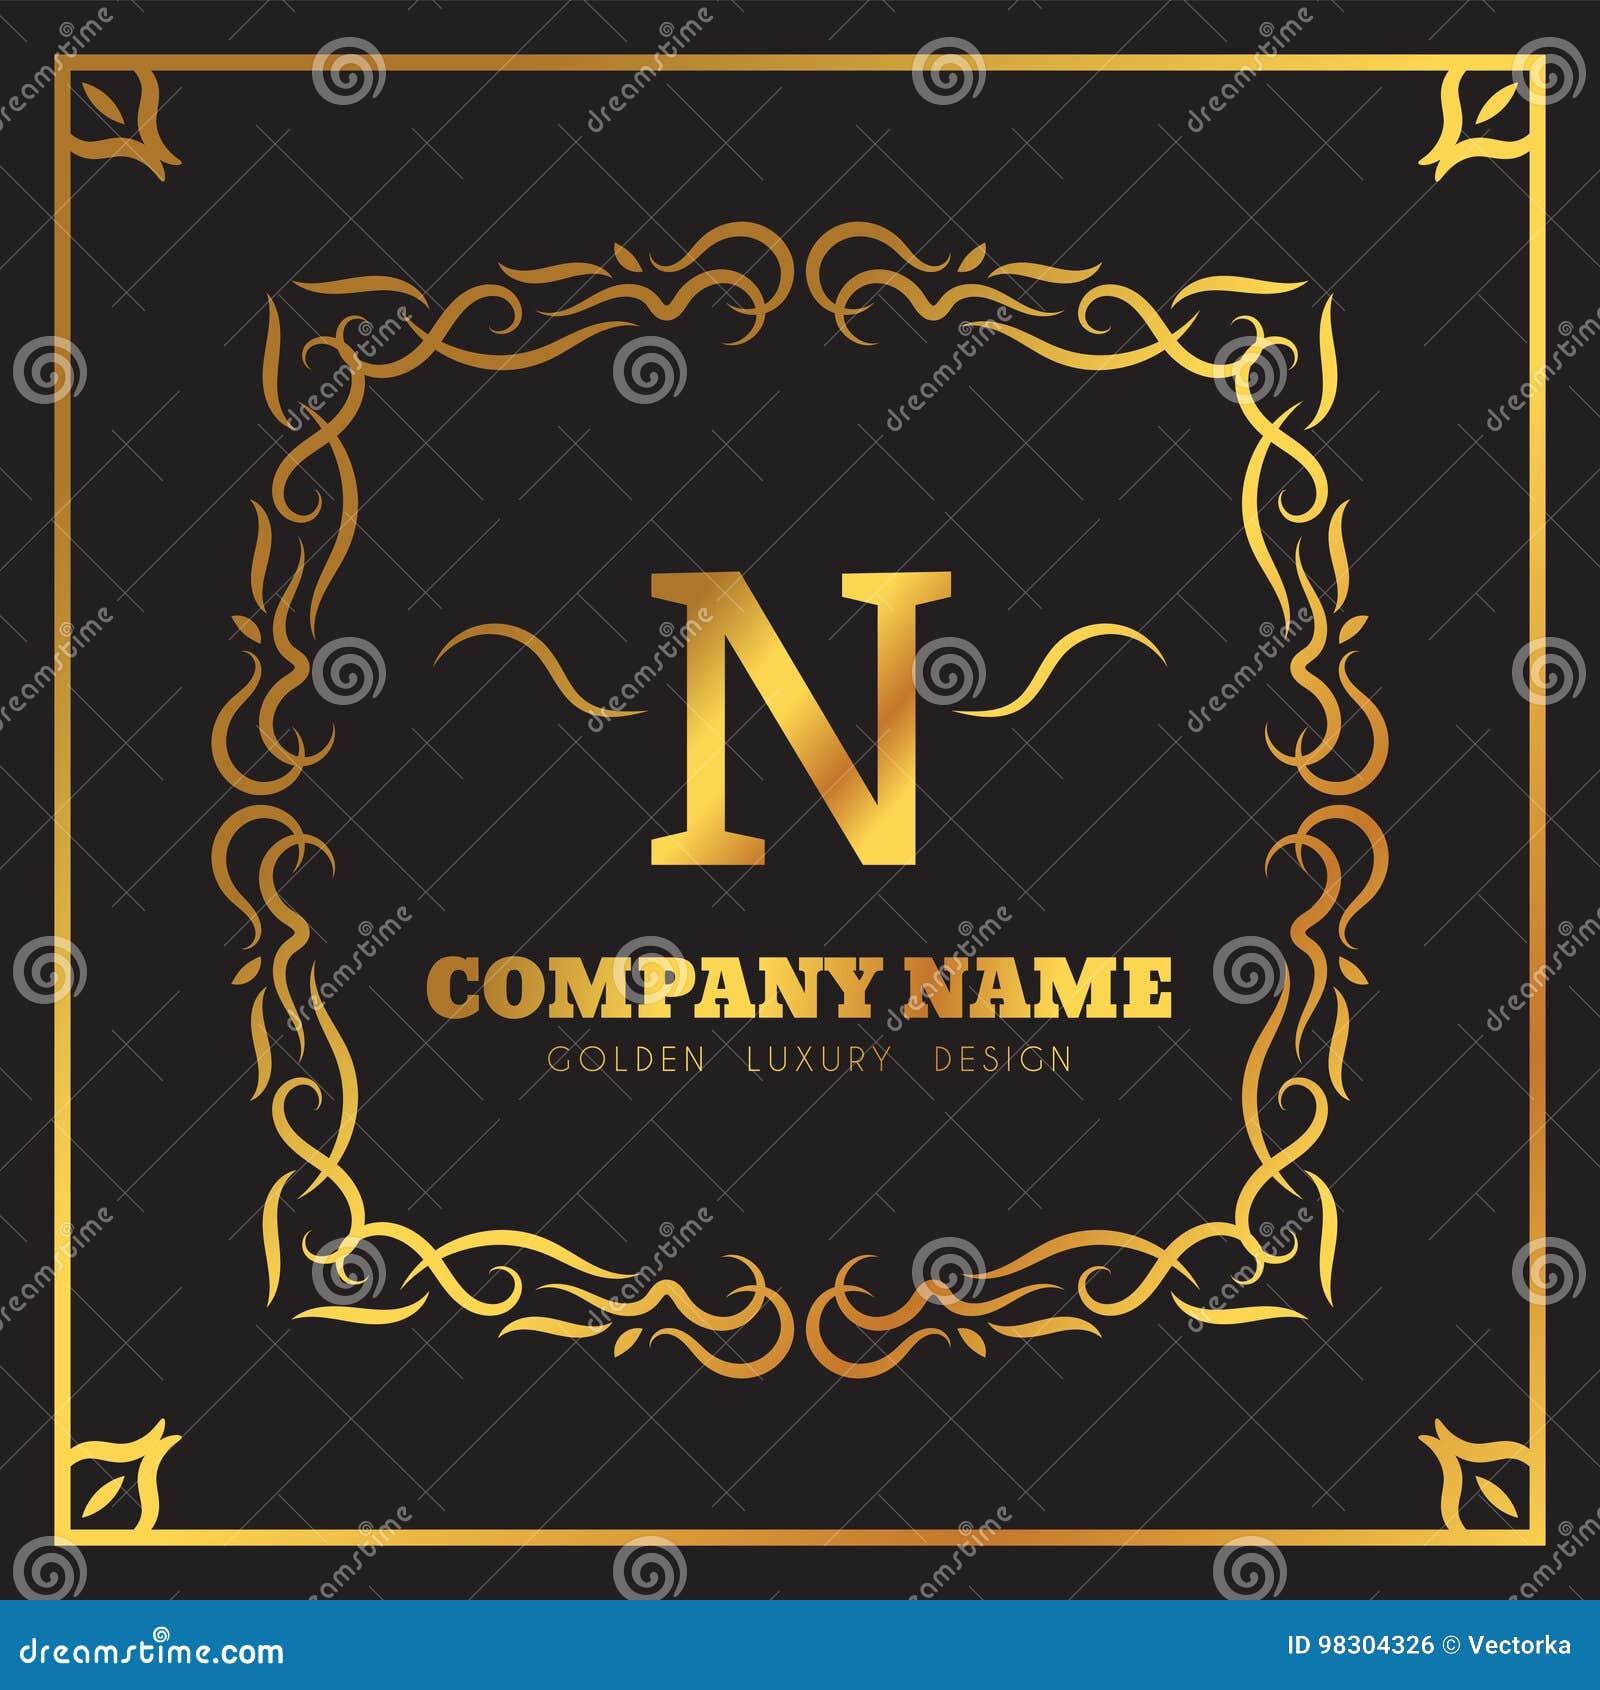 Golden Logo template Elegant flourishes calligraphic. Monogram N letter emblem. Vintage ornament lines. Luxury Business